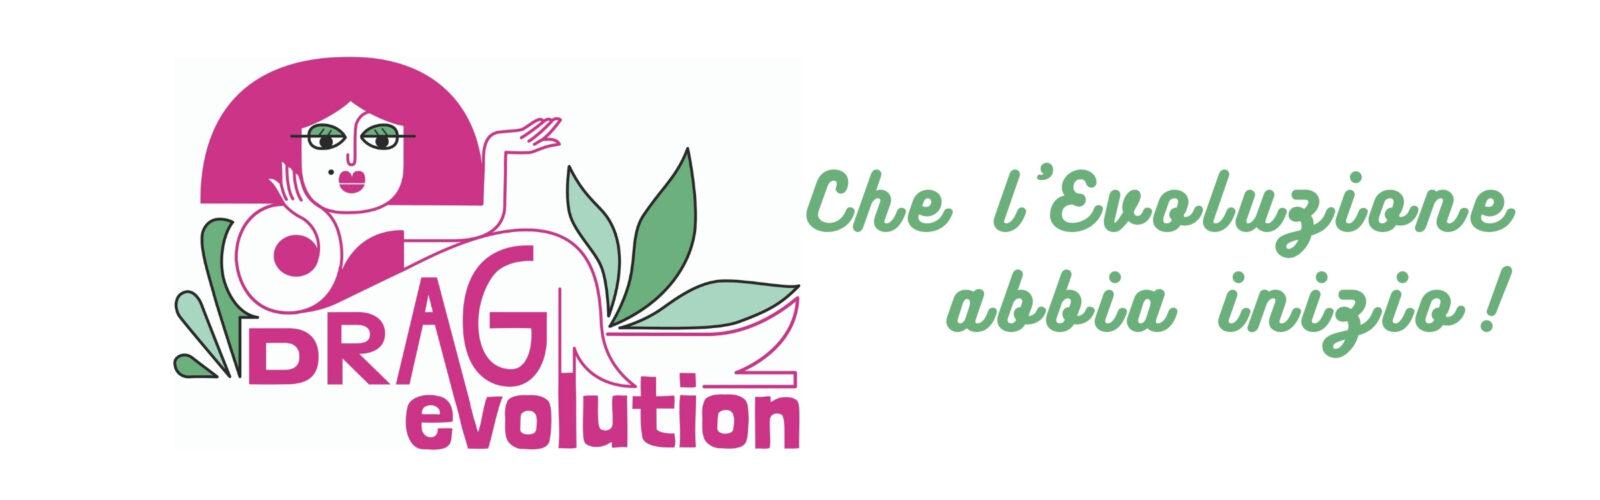 Drag Evolution!